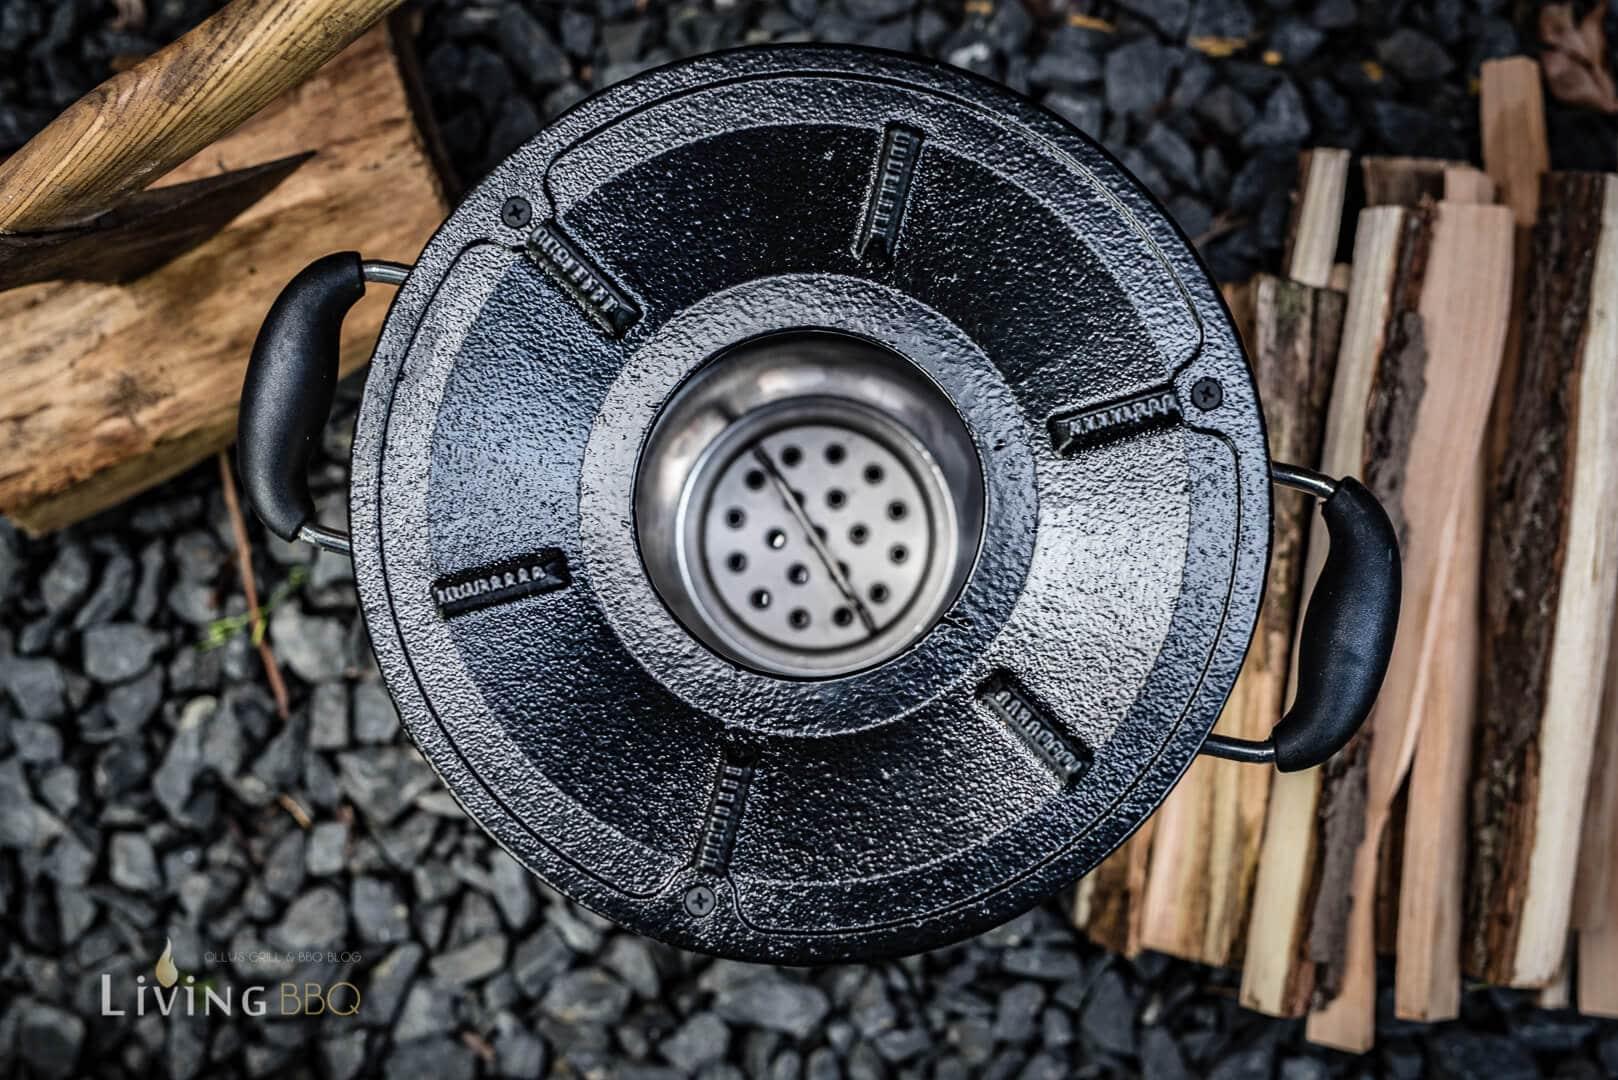 Holzkohle Einsatz Raketenofen _Raketen Ofen 8 von 32